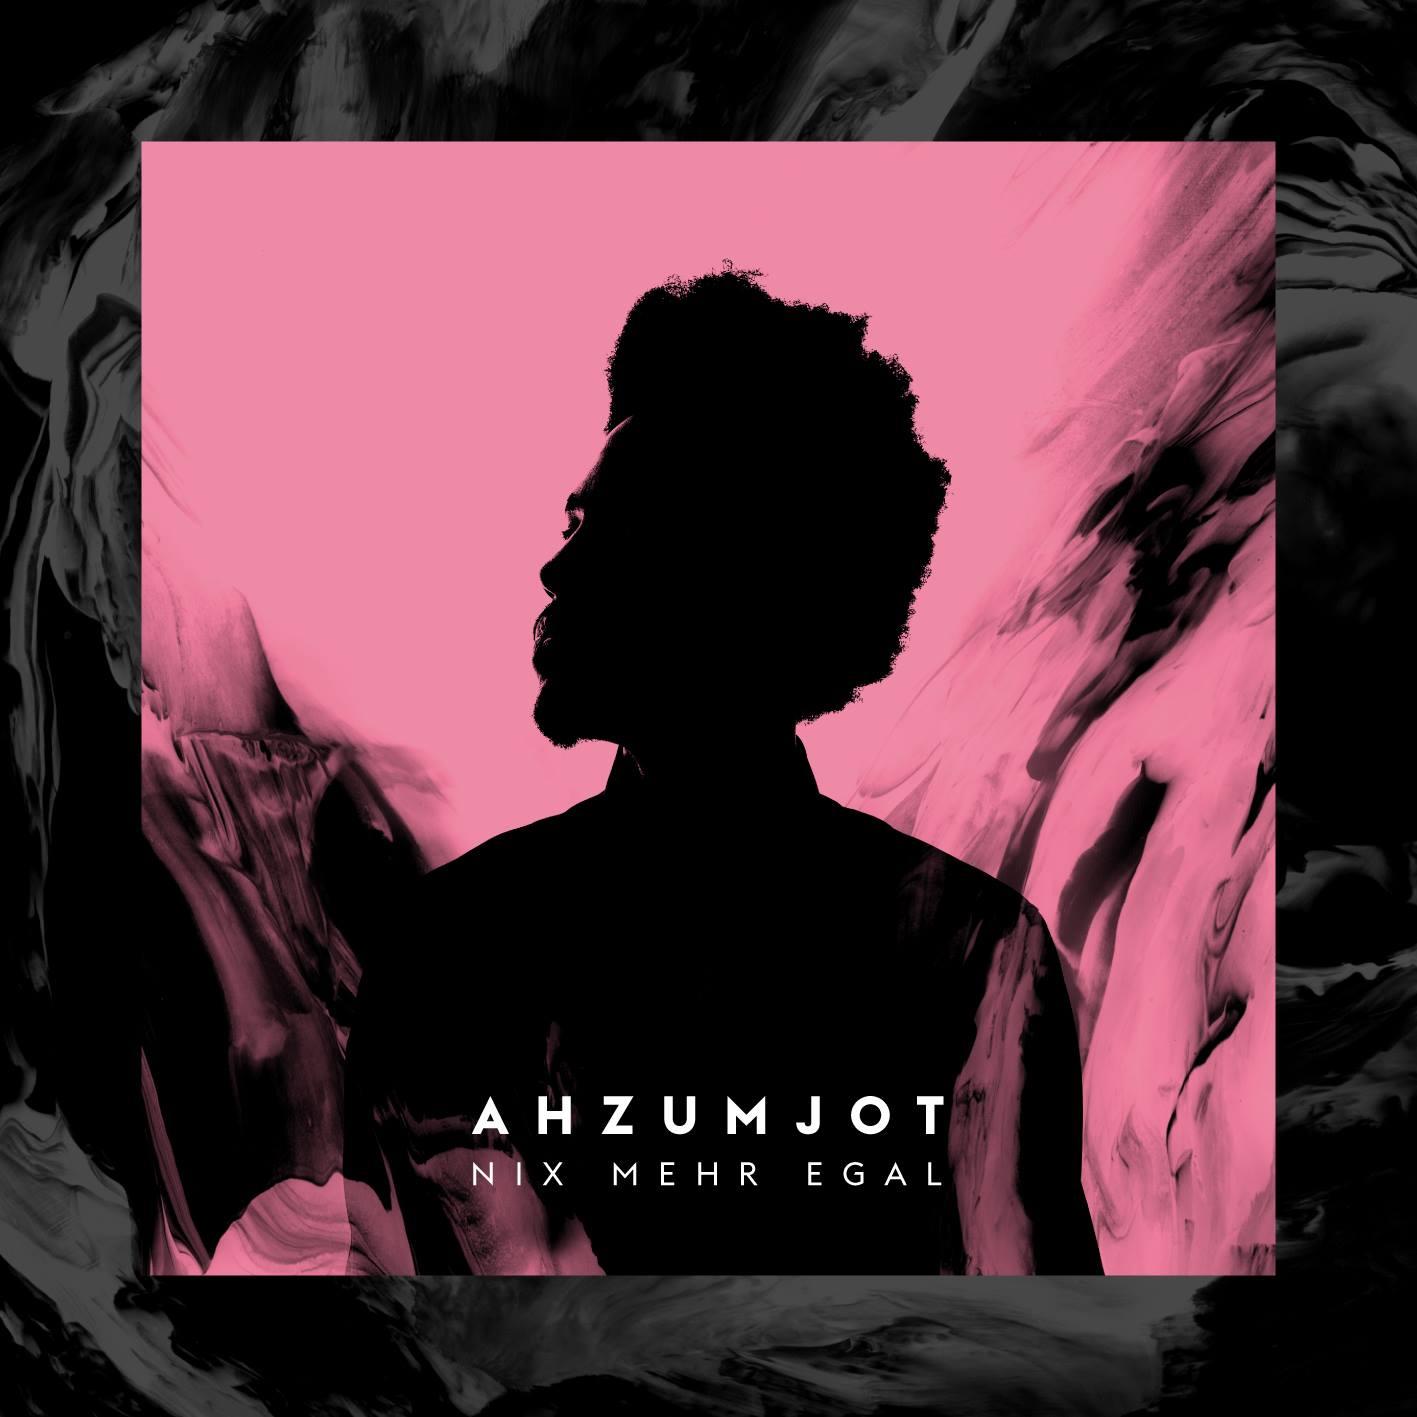 Ahzumjot – Nix mehr egal Album Cover